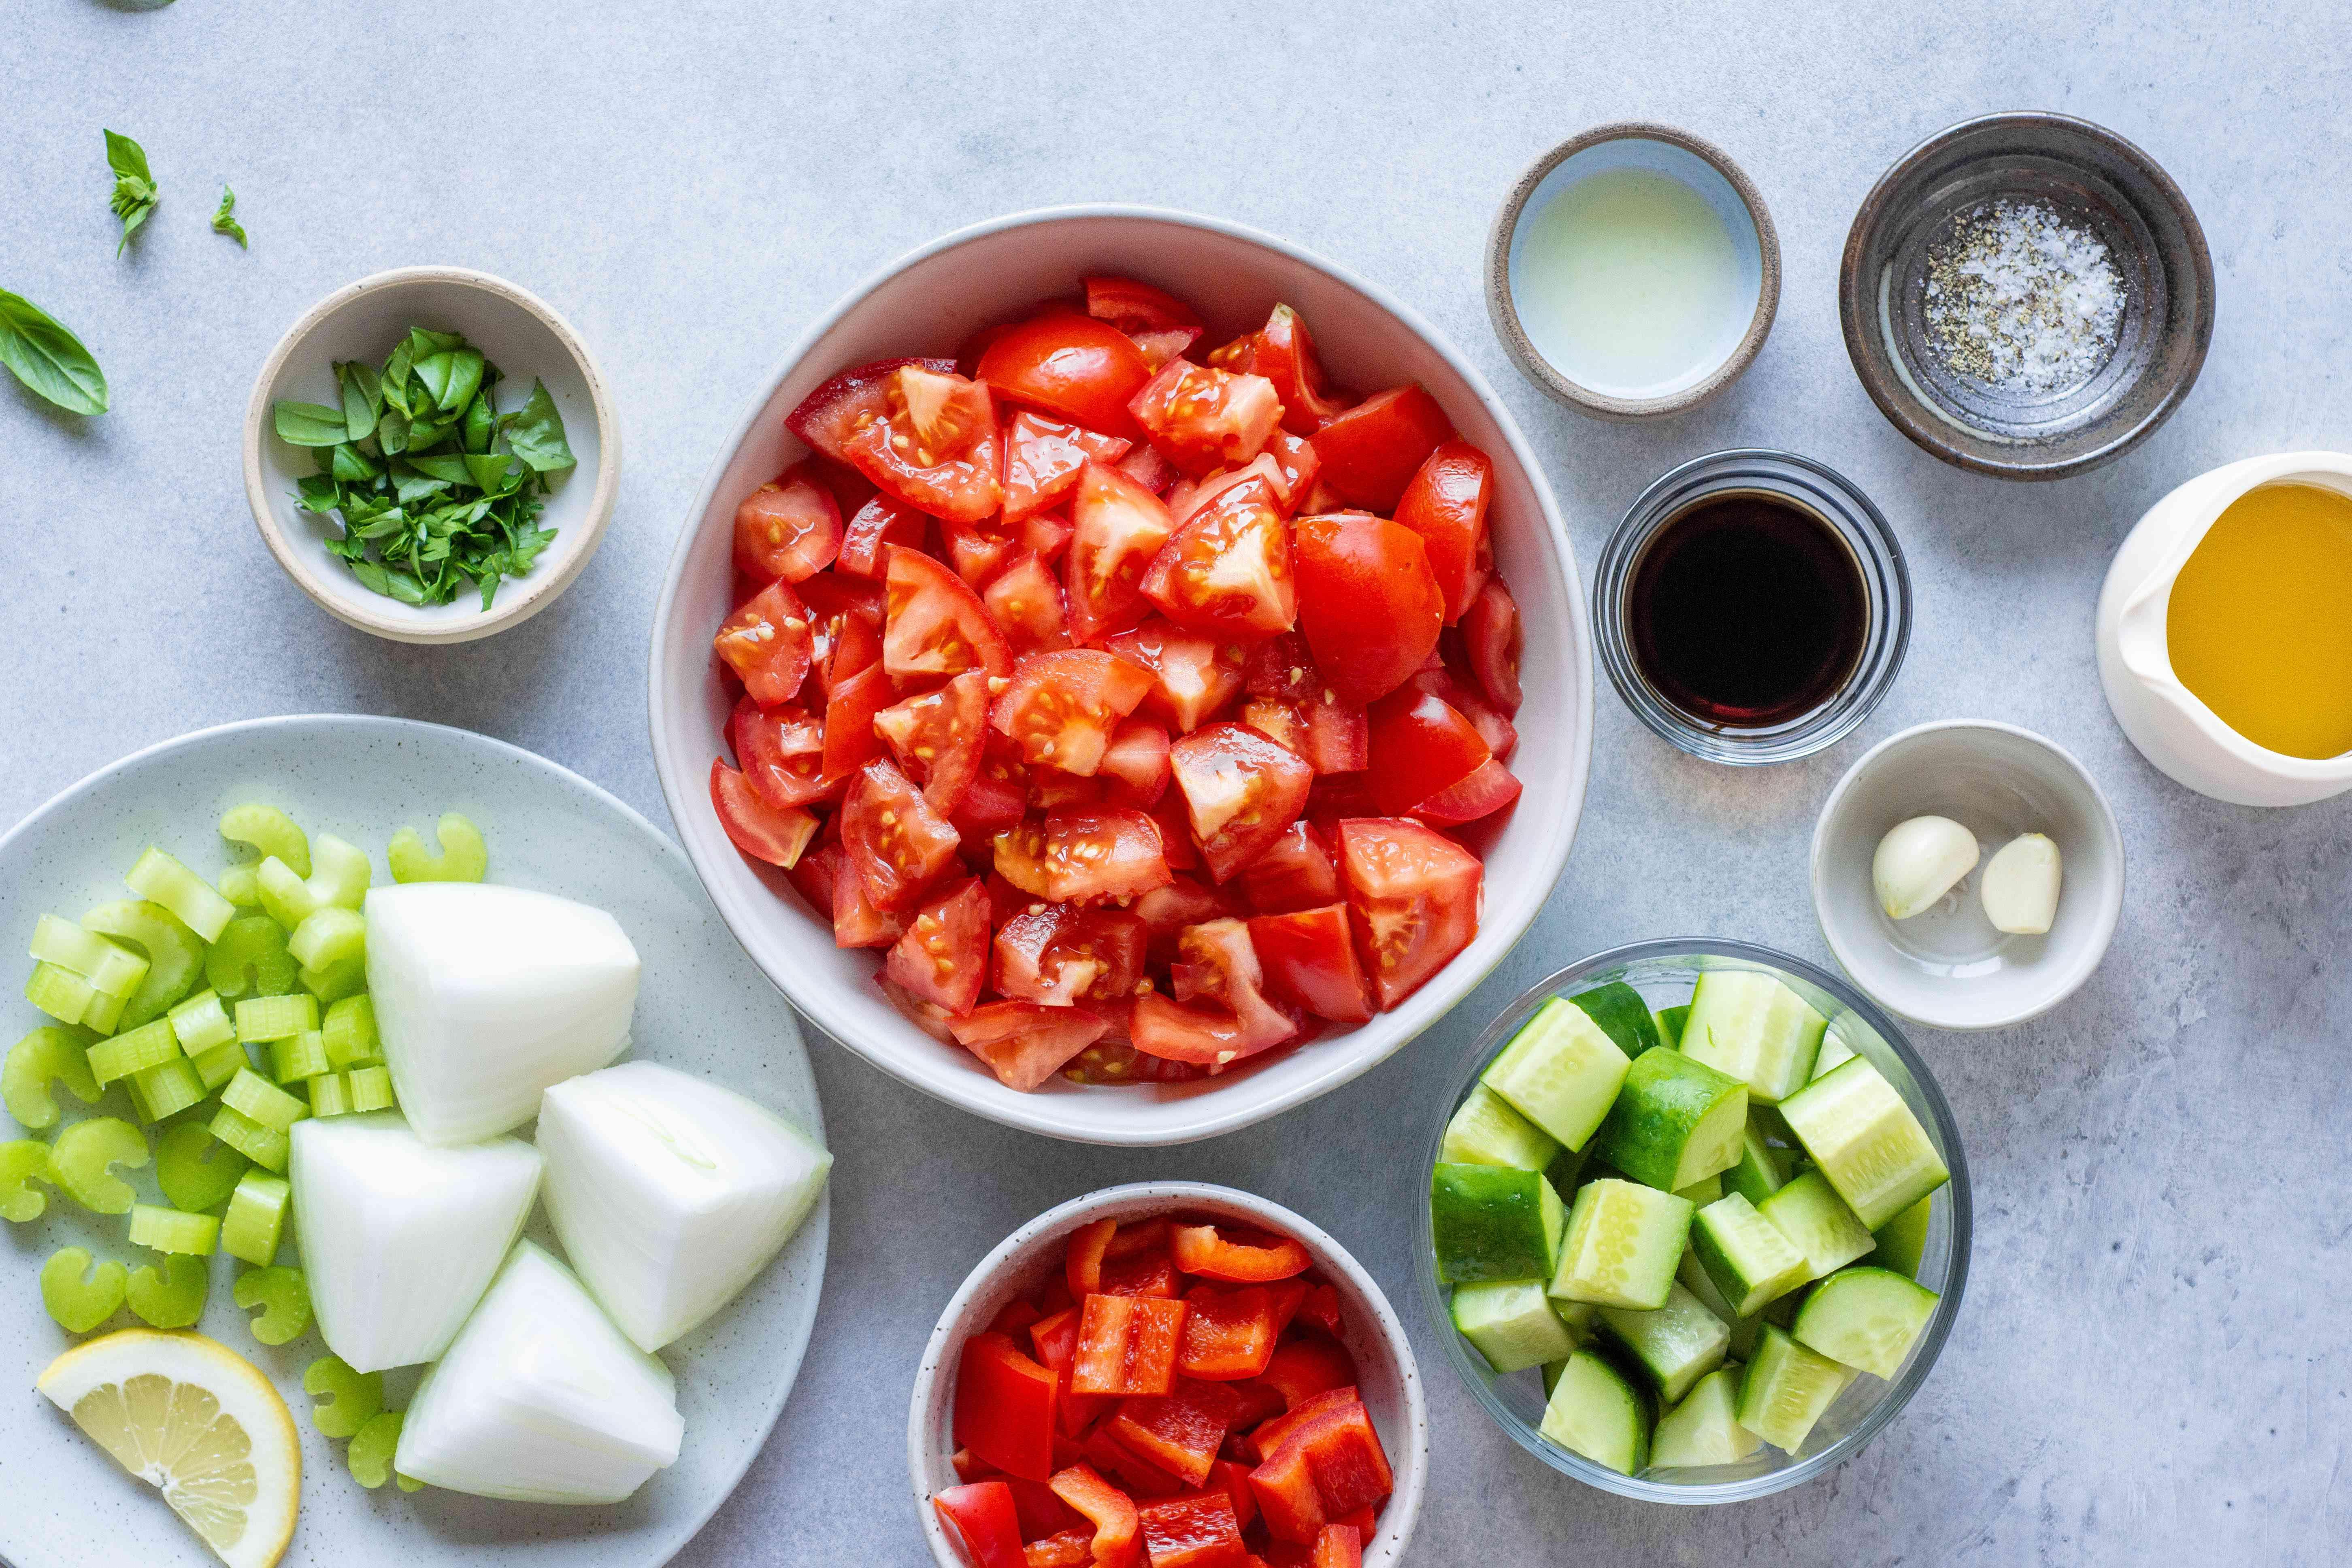 Ingredients for vegan gazpacho